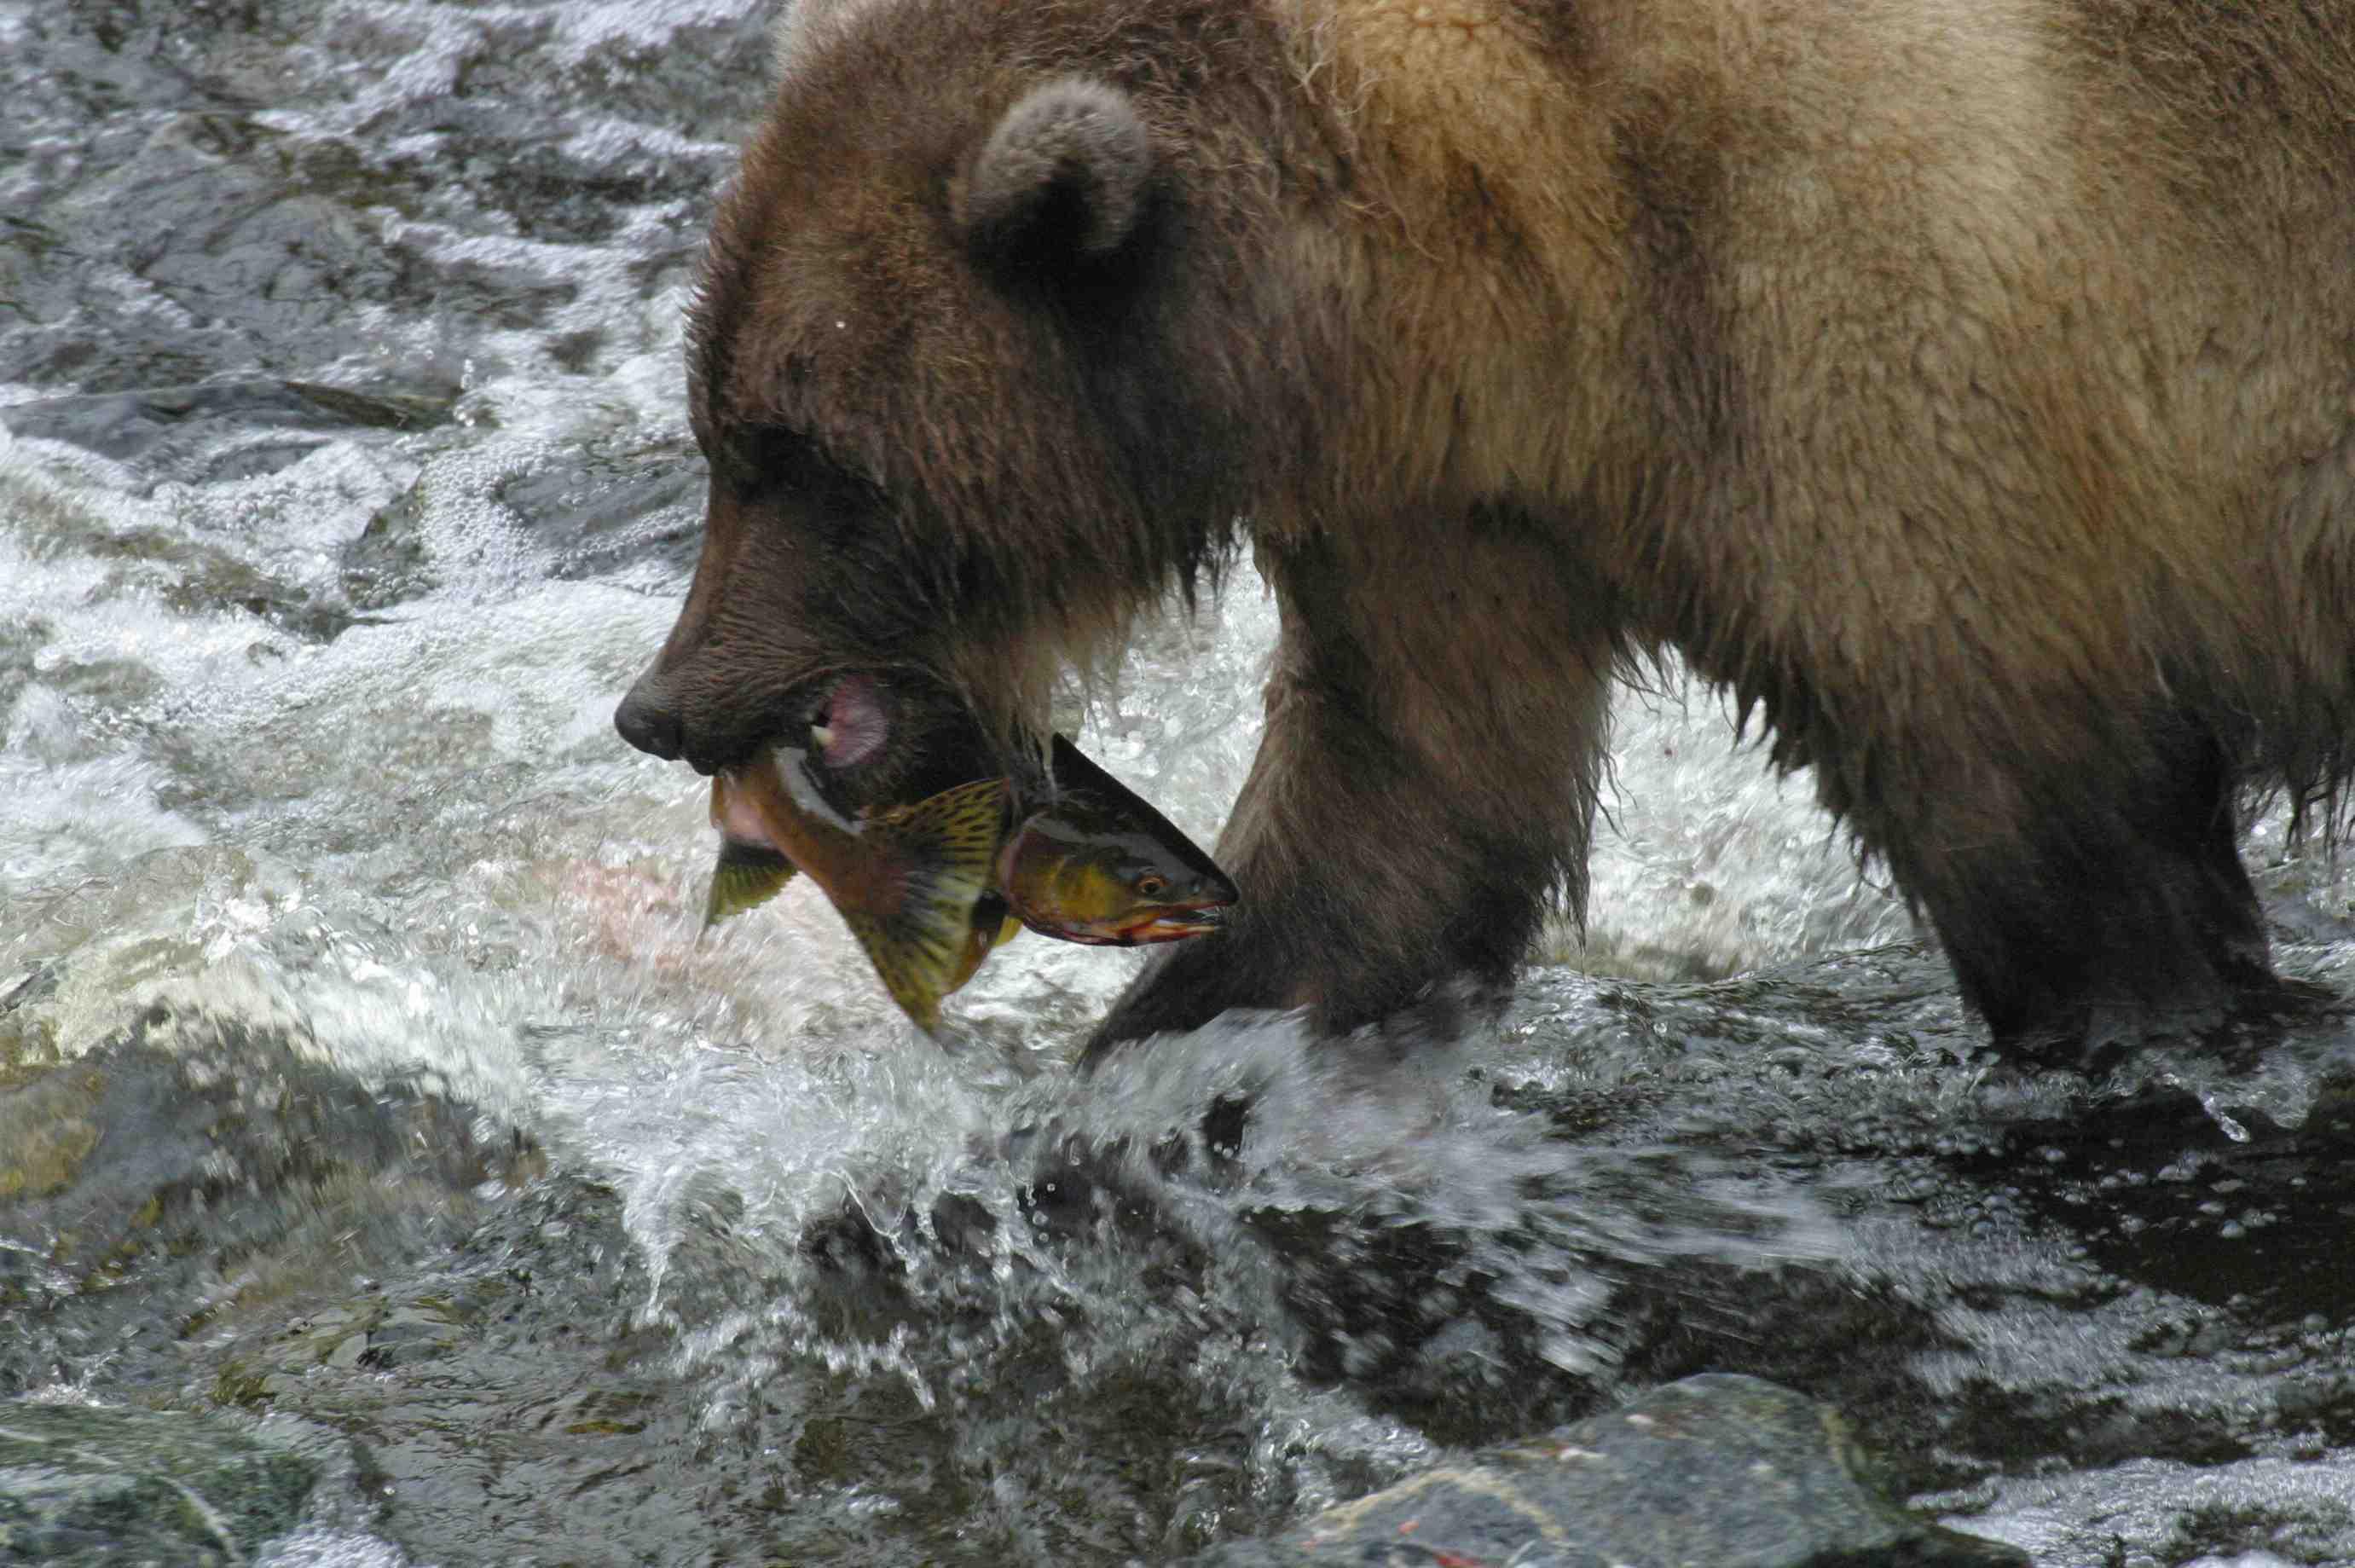 Fish farms pushing wild salmon to extinction stephen for Bear catching fish